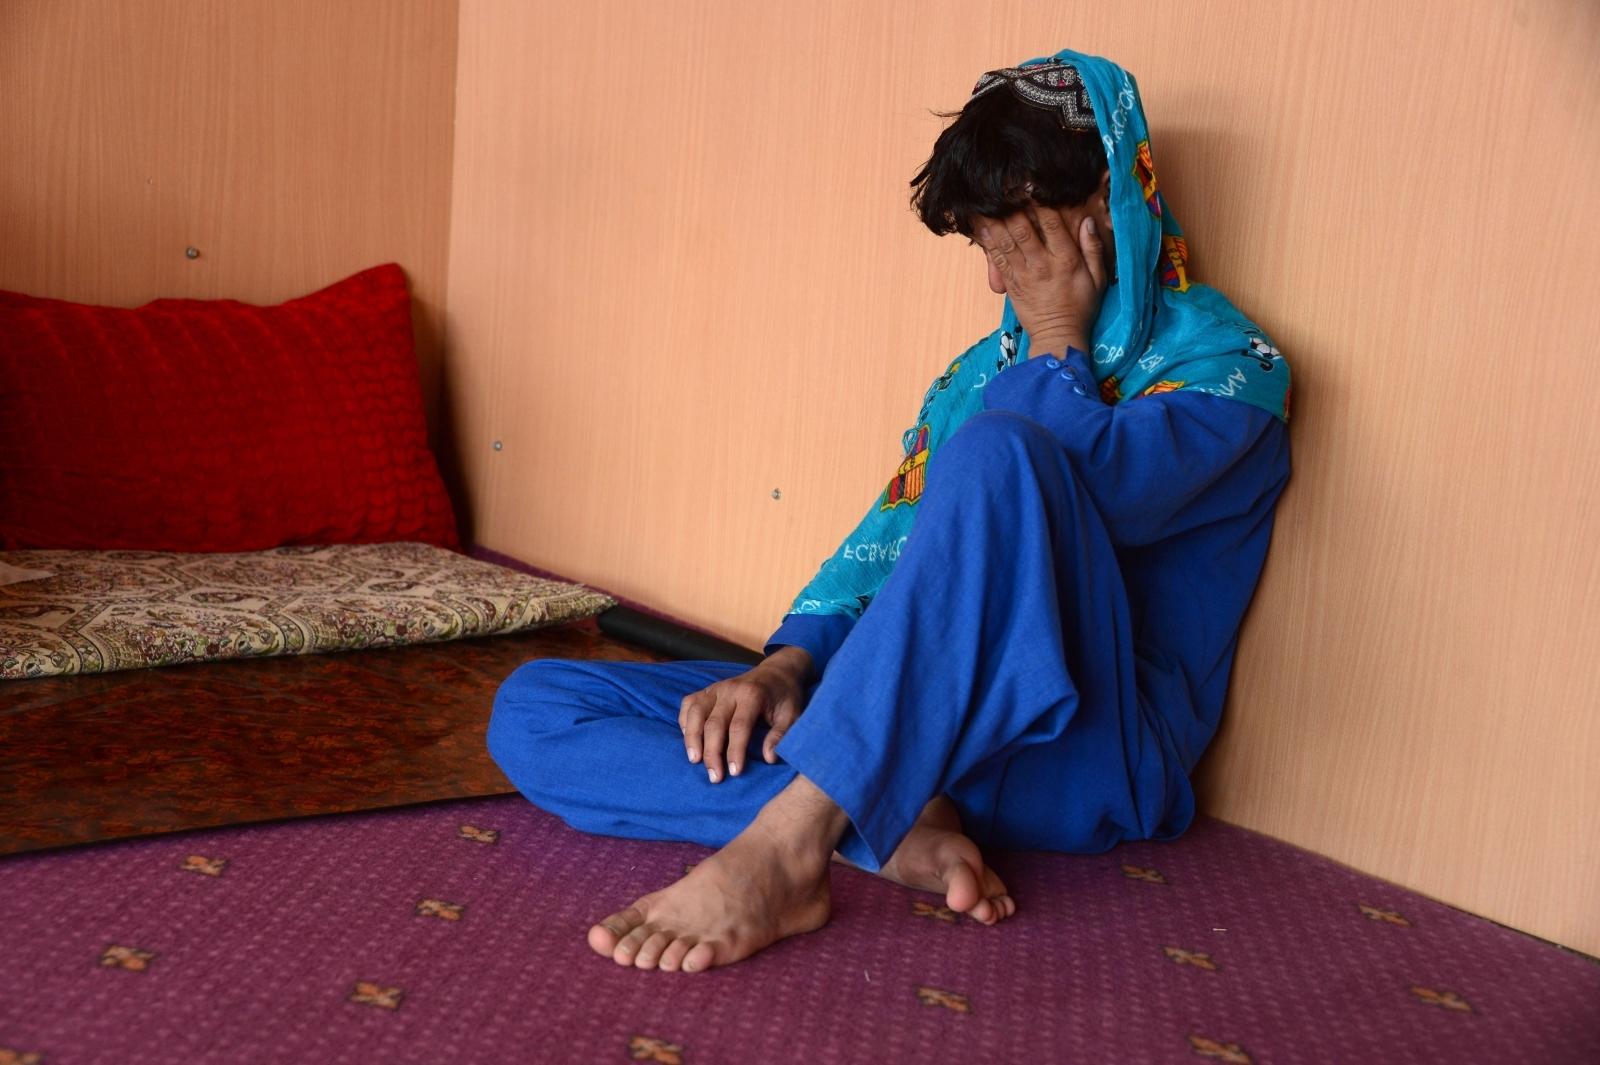 Bacha Baazi Afghan boys